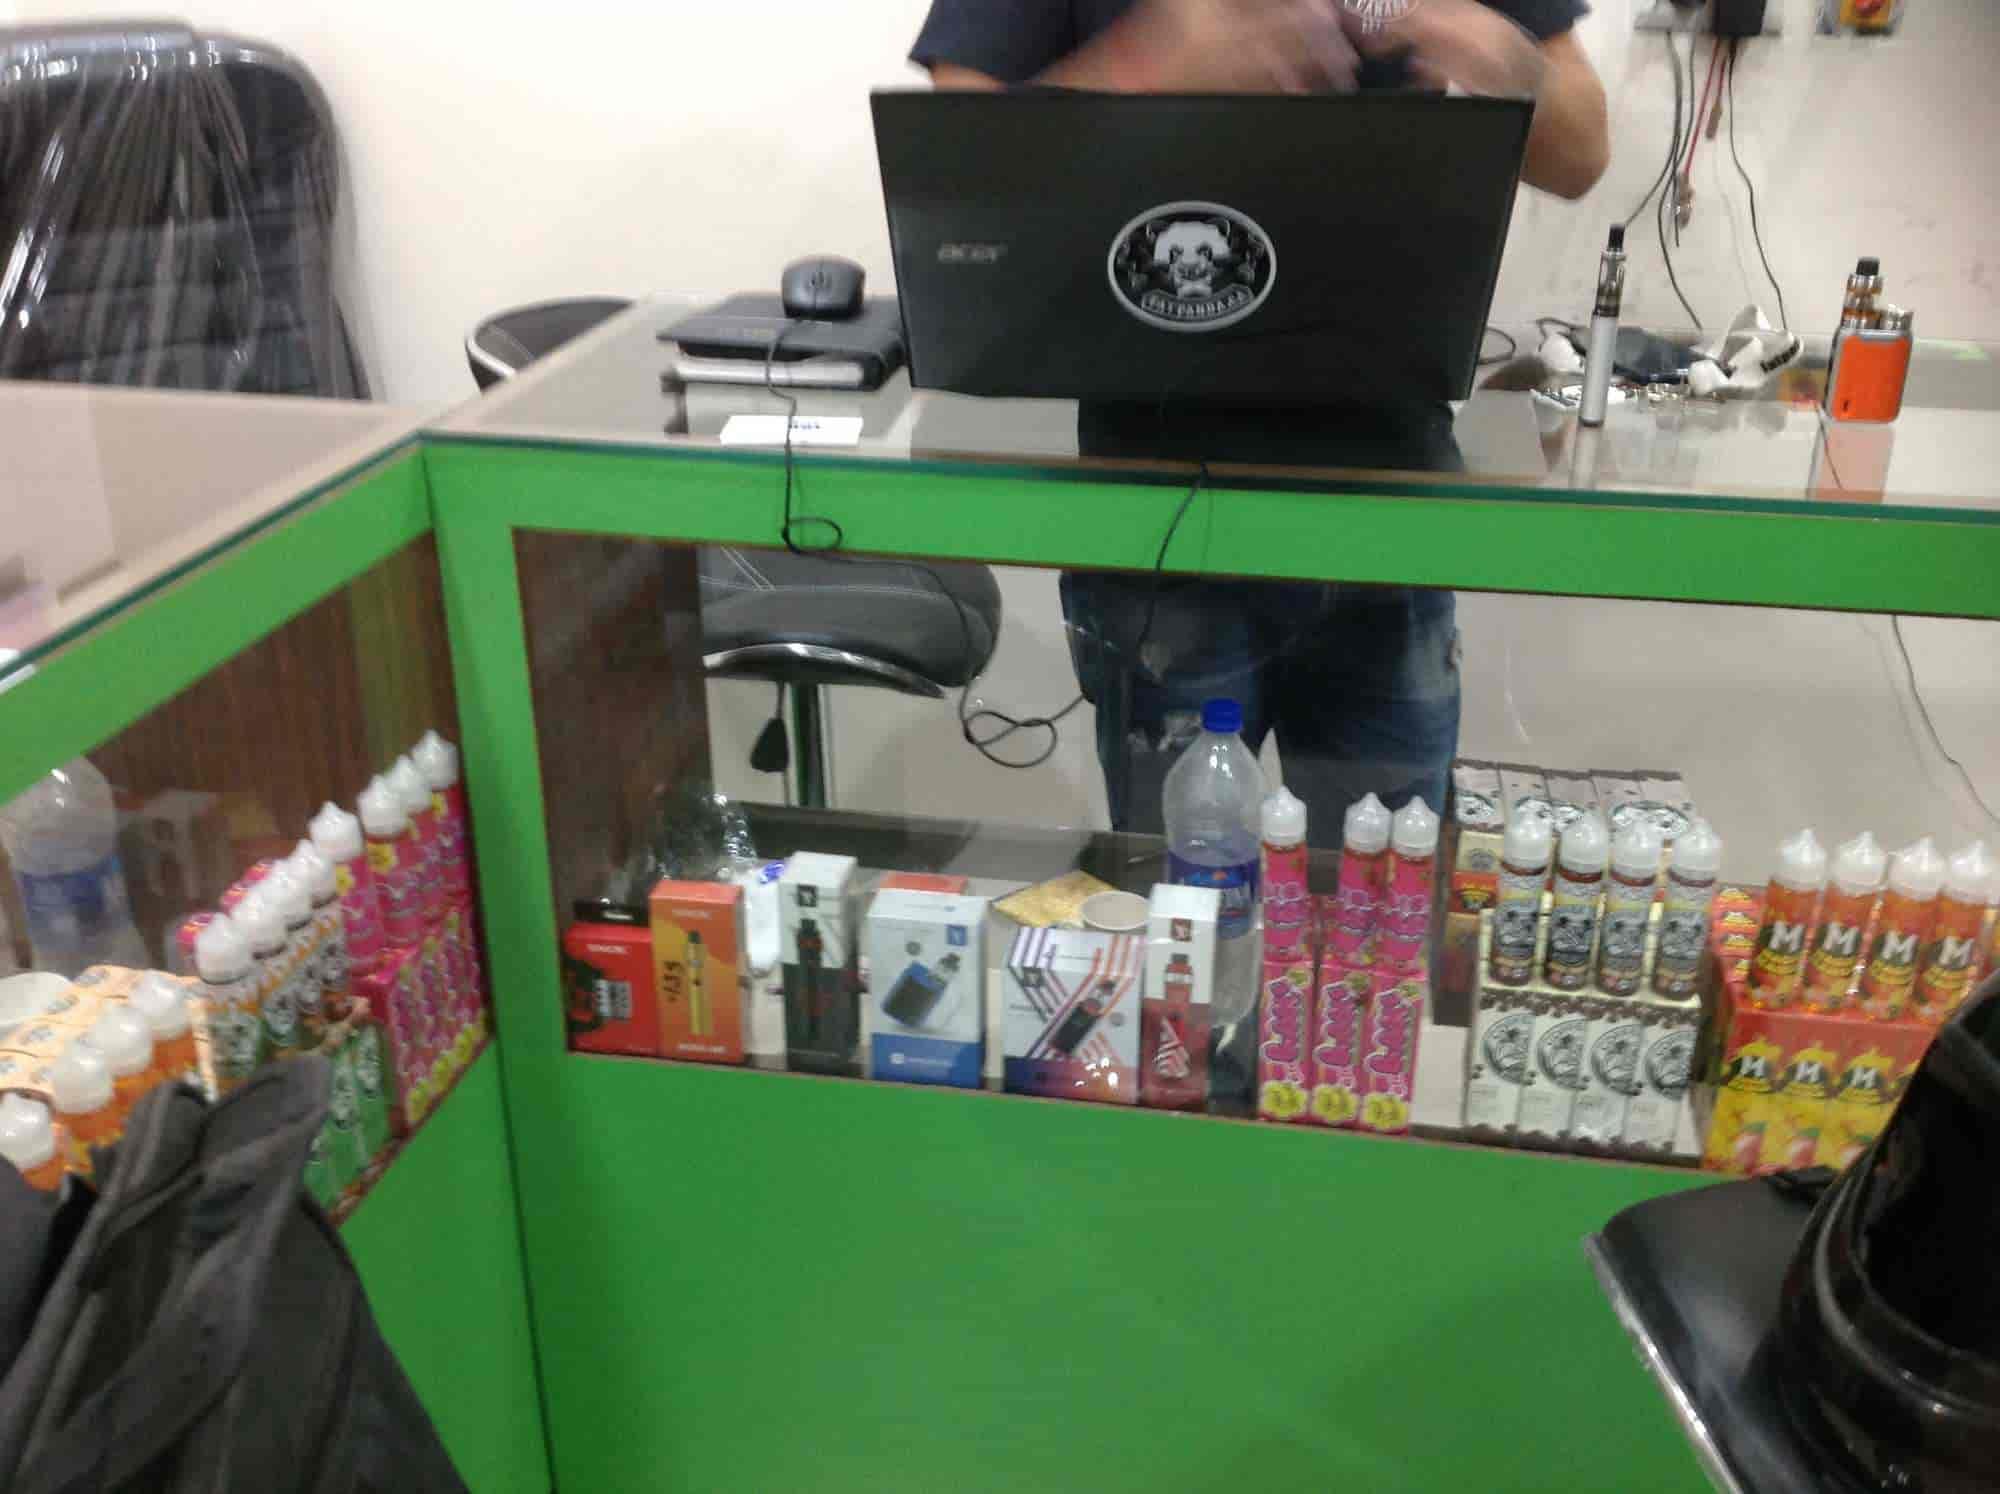 Fat Panda INDIA A Vape Shop, Vikaspuri - Cigarette Retailers